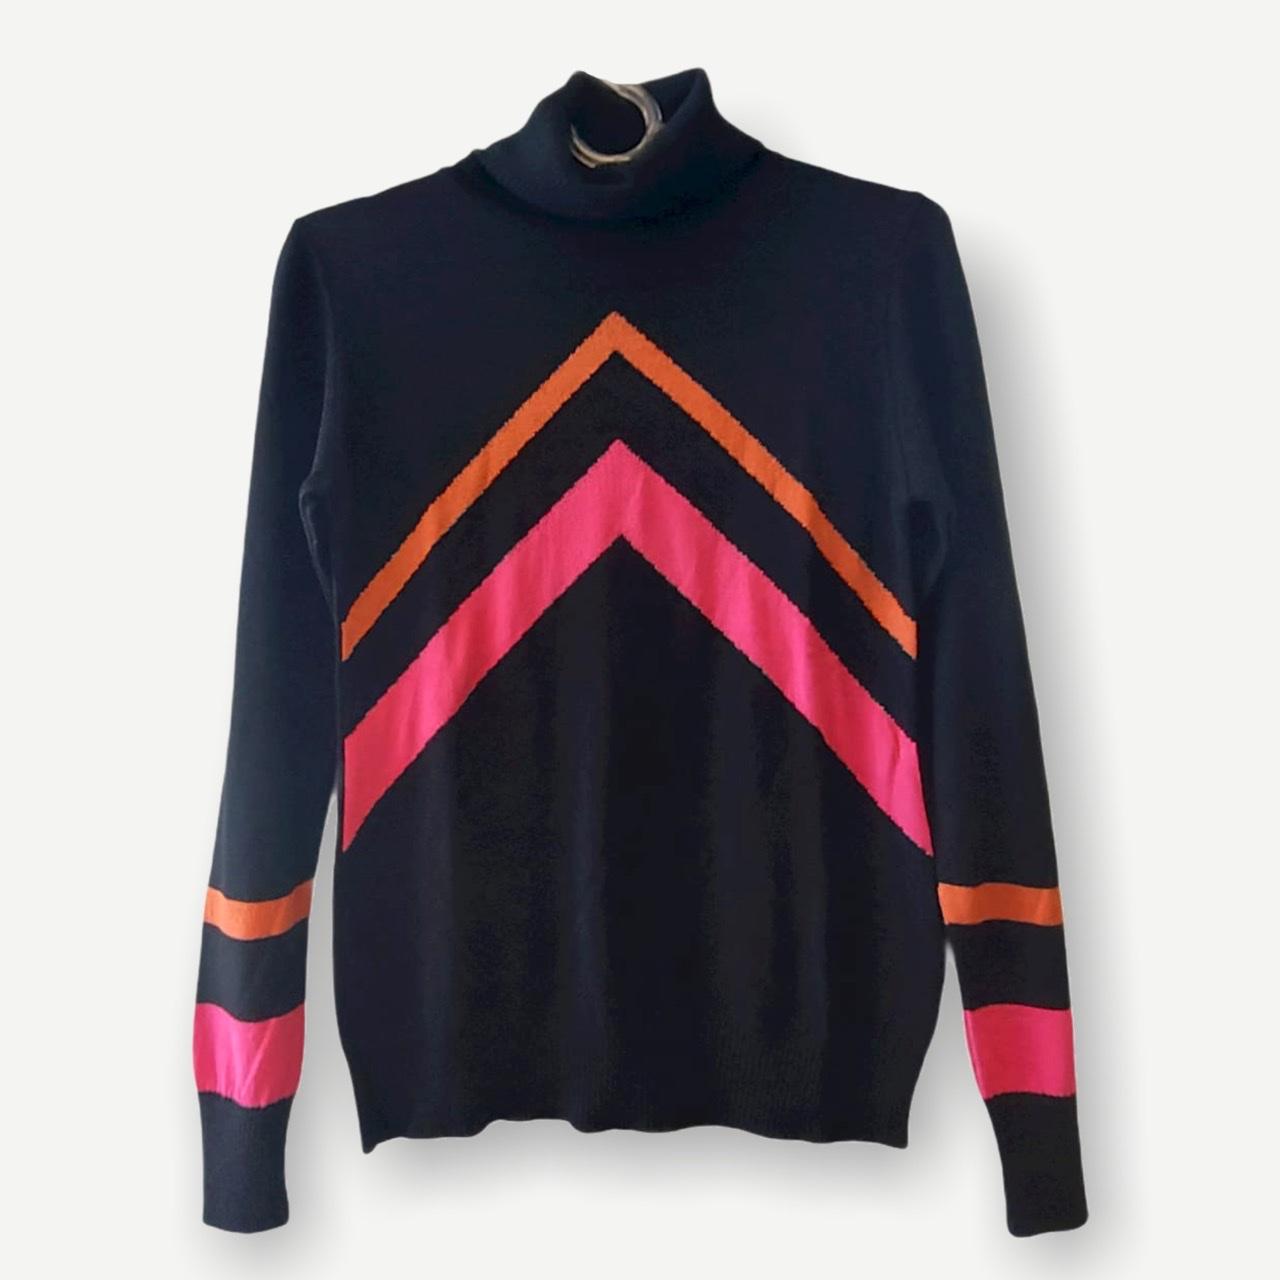 Blusa Nathalia preta e neon tricot  - Vivian Bógus